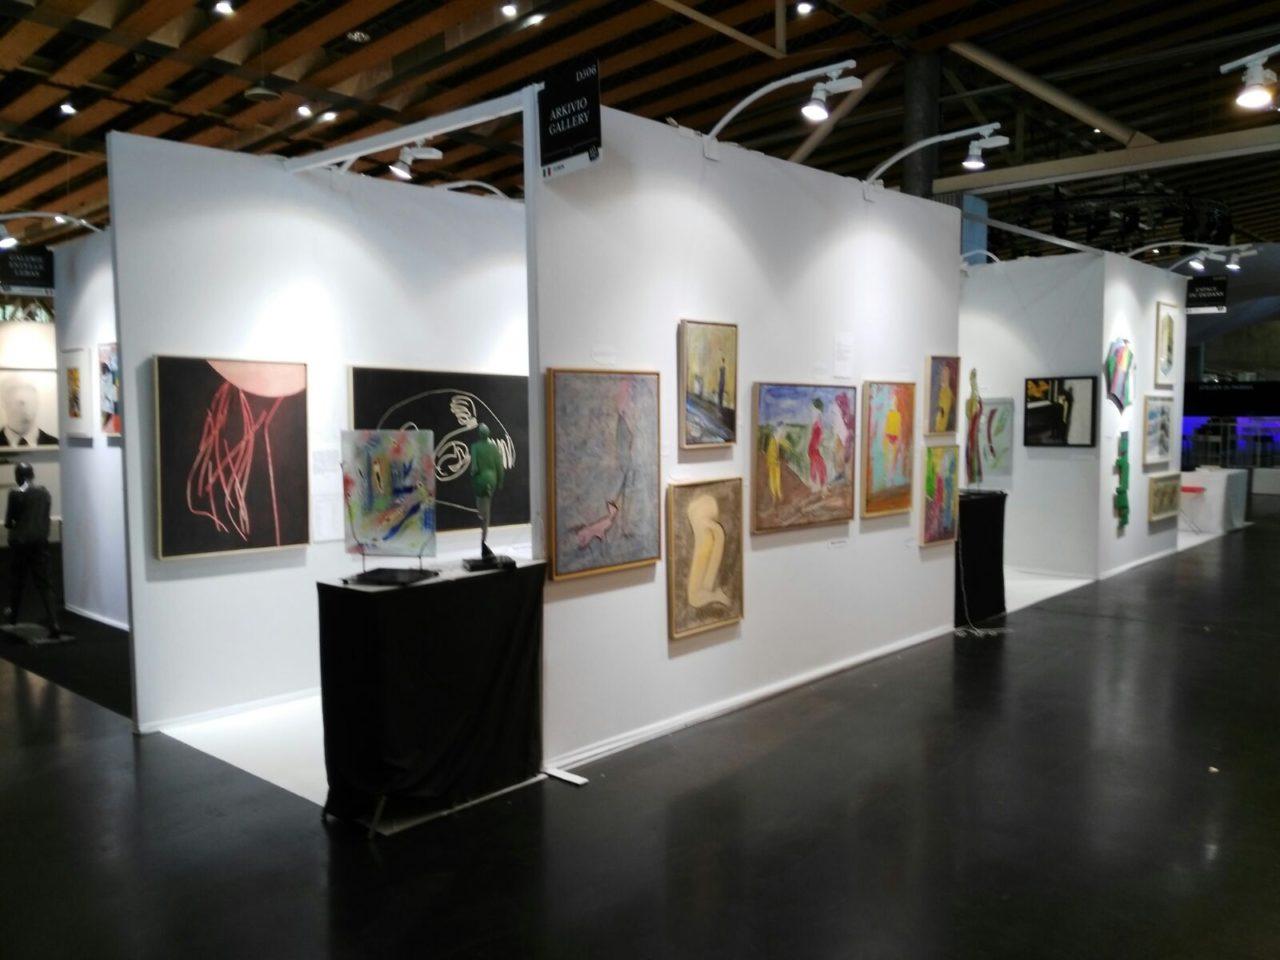 Paolo Ambrosio Arkivio Galley, Art Up -Lille